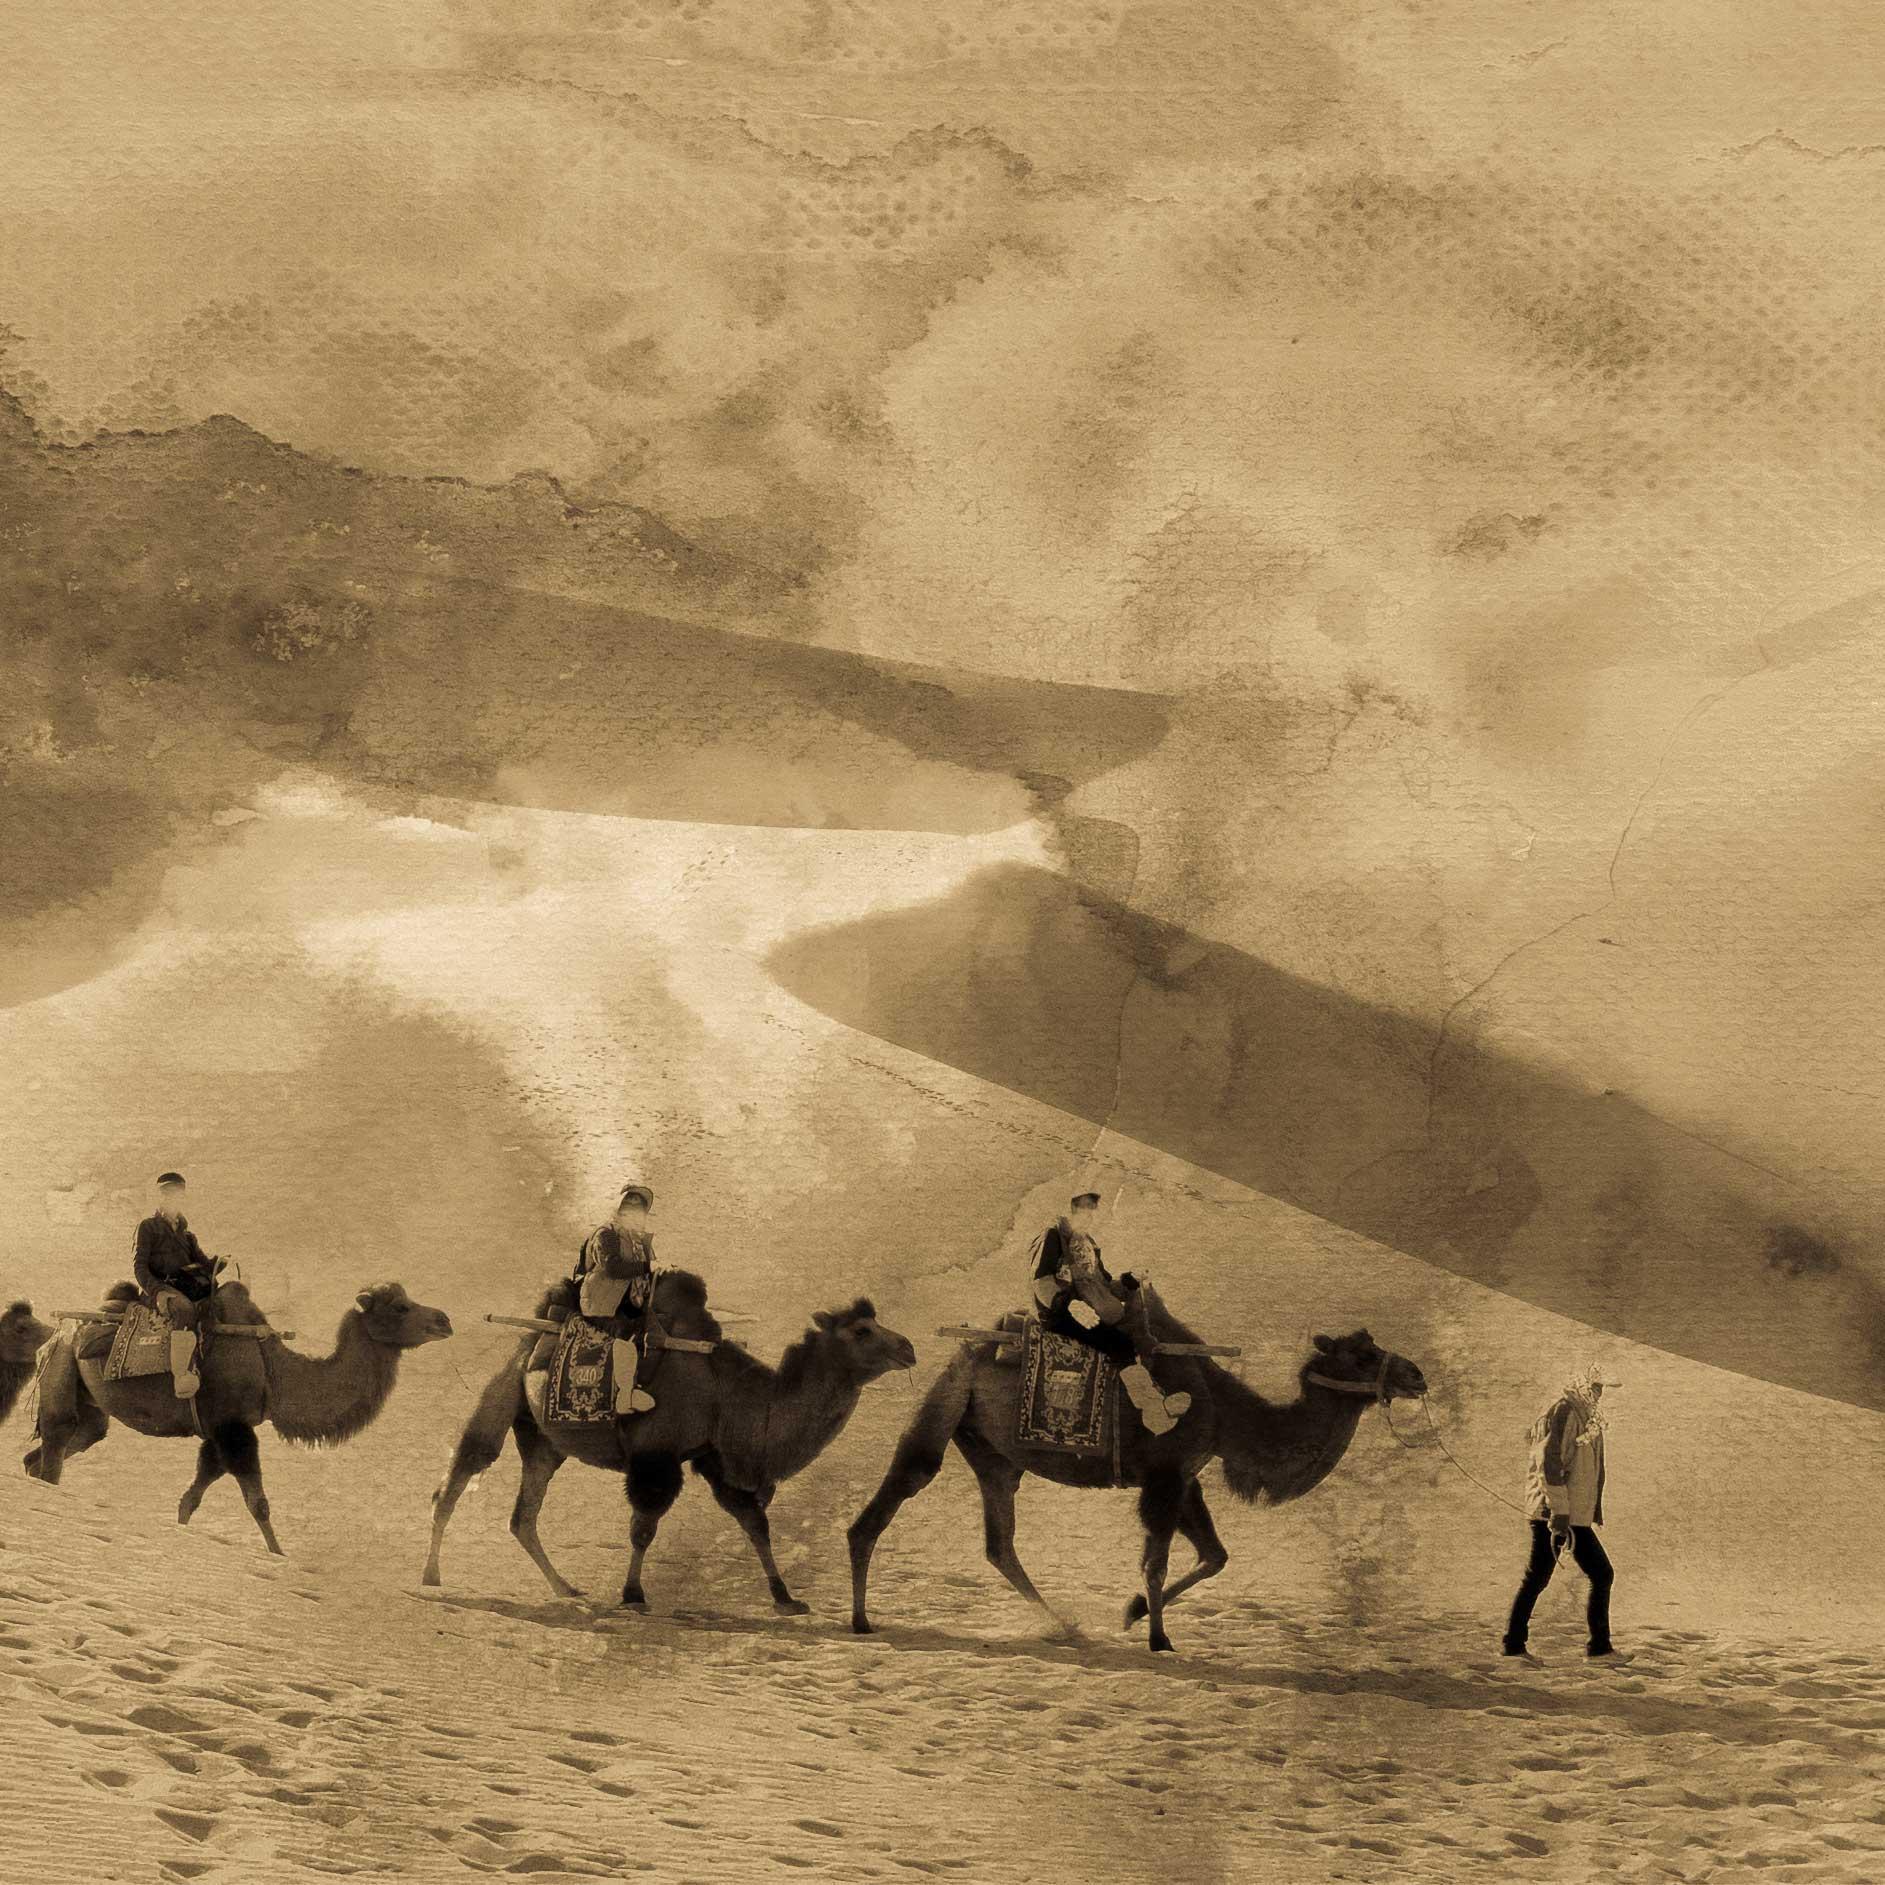 S: Silk Road